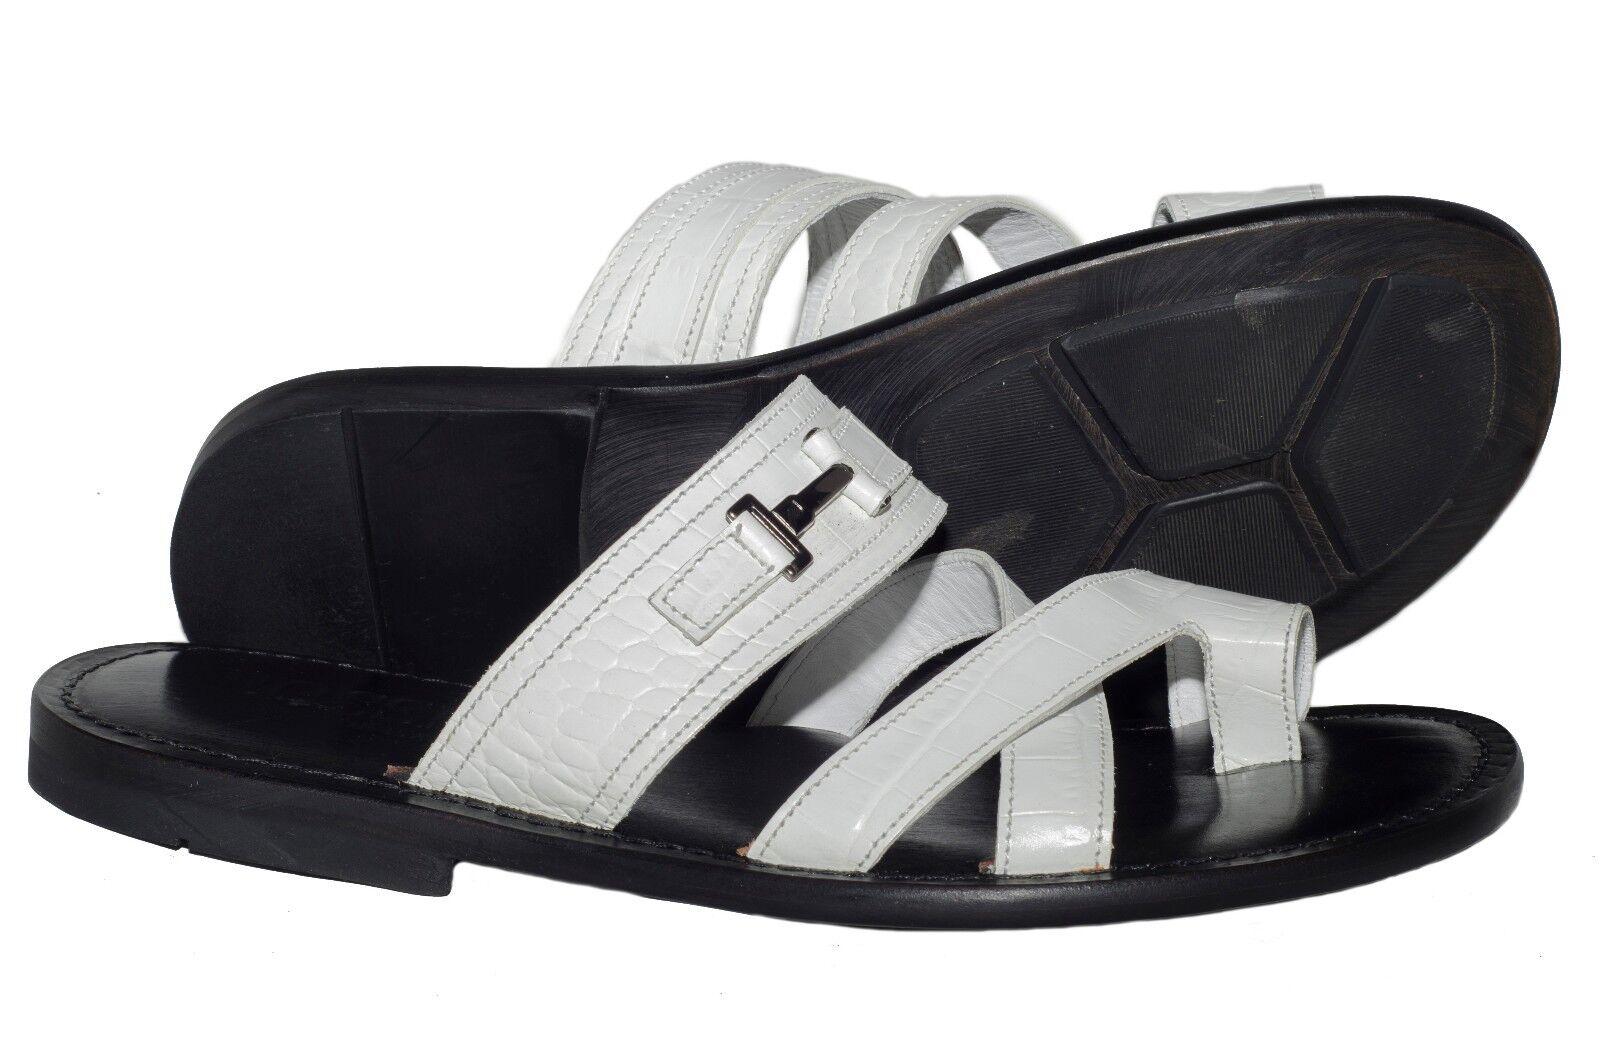 Rossi RS805 Italiam mens white leather push-in -toe sandals